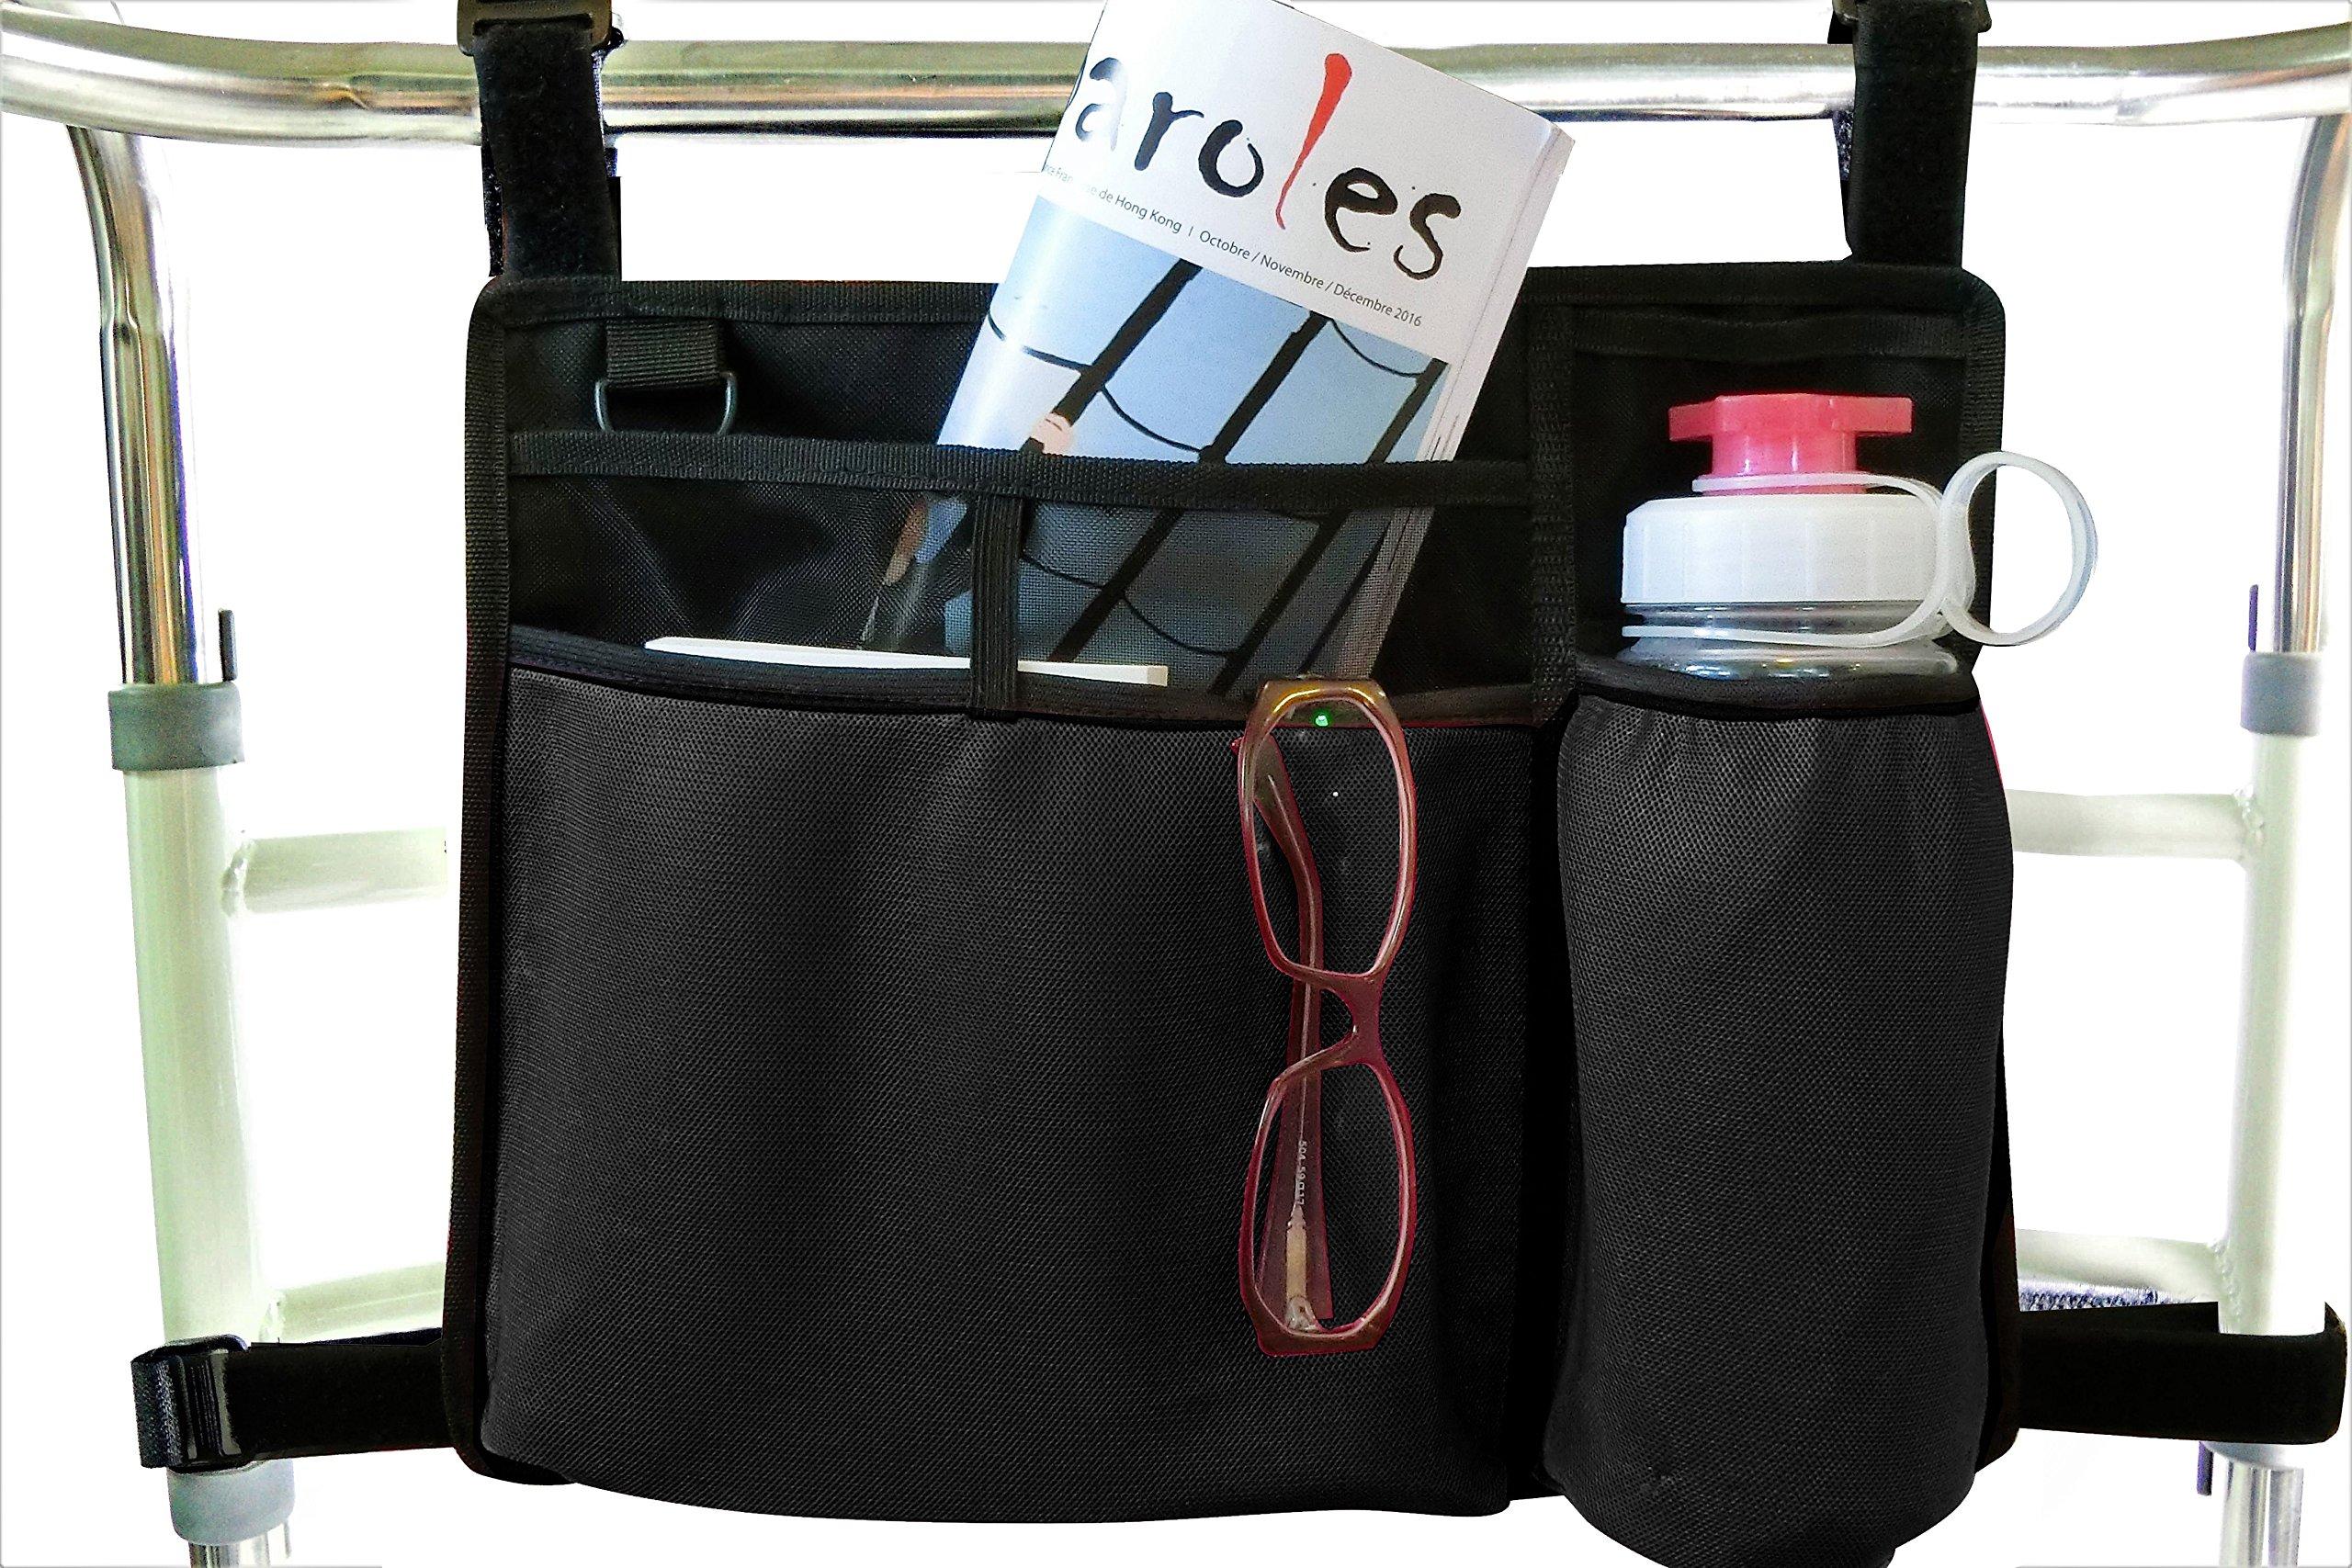 Folding Walker Bag, Wheelchair Side Pouch, Rollator Pouch, Bed Rail Organizer, Insulated Bottle Holder, Zipper Pocket, Key Holder Long Strap, Black